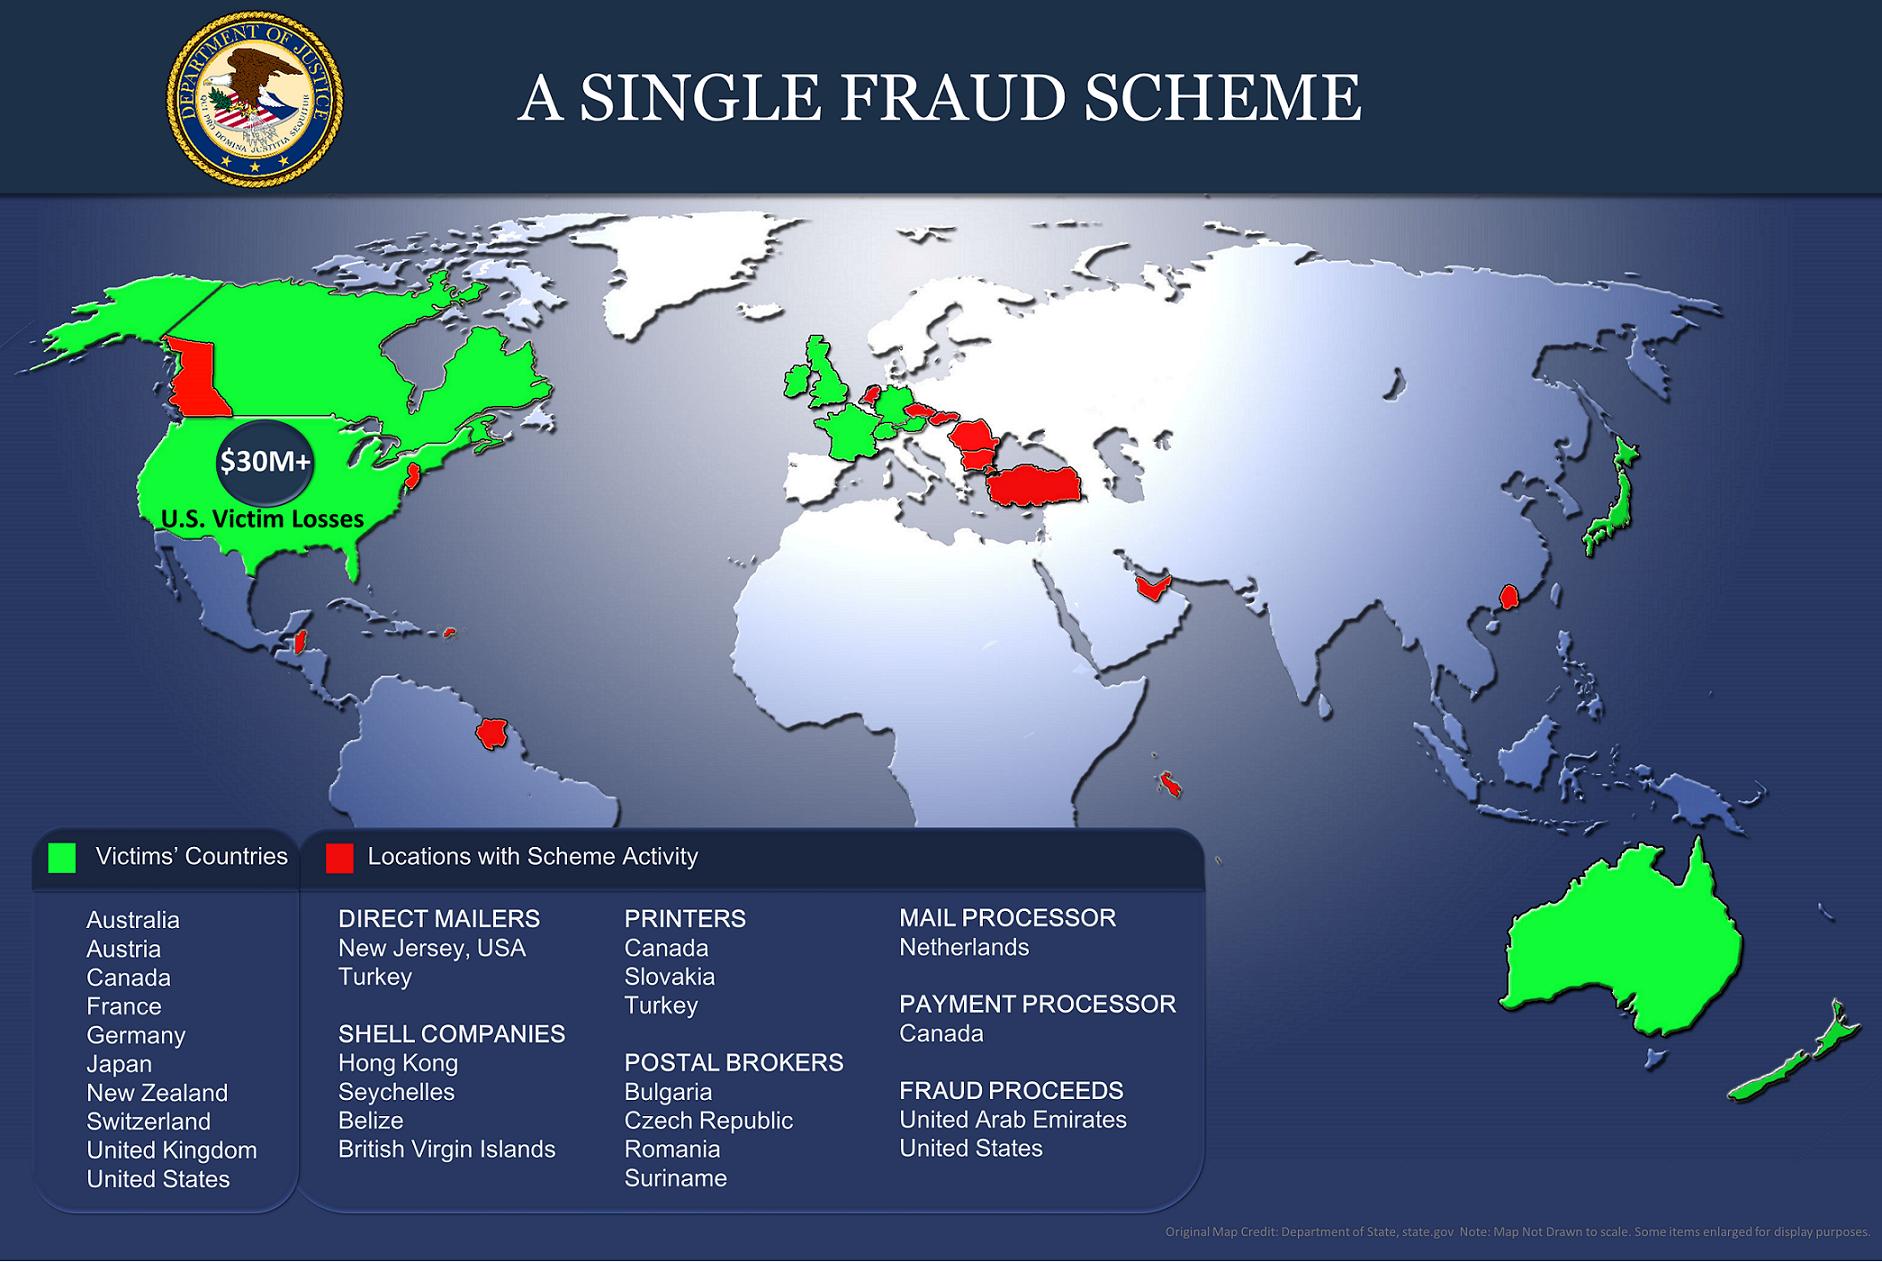 Justice Department Coordinates Nationwide Elder Fraud Sweep of More Than 250 Defendants